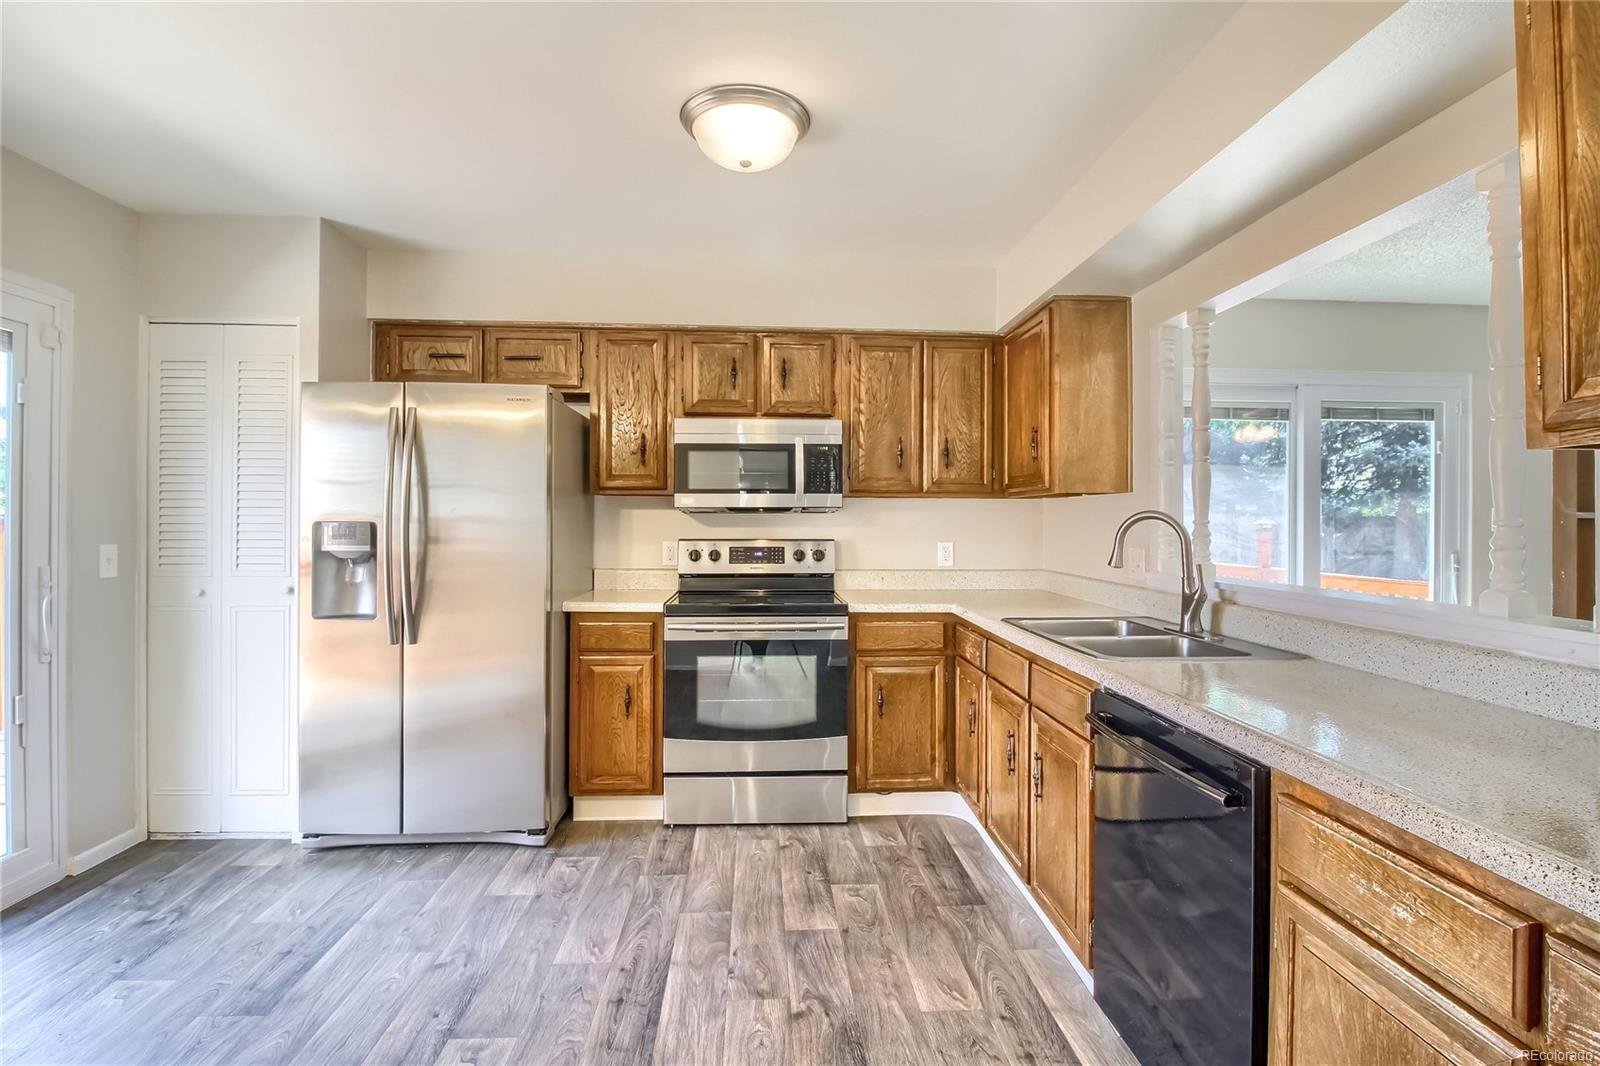 MLS# 4817896 - 15 - 5080 Worchester Street, Denver, CO 80239